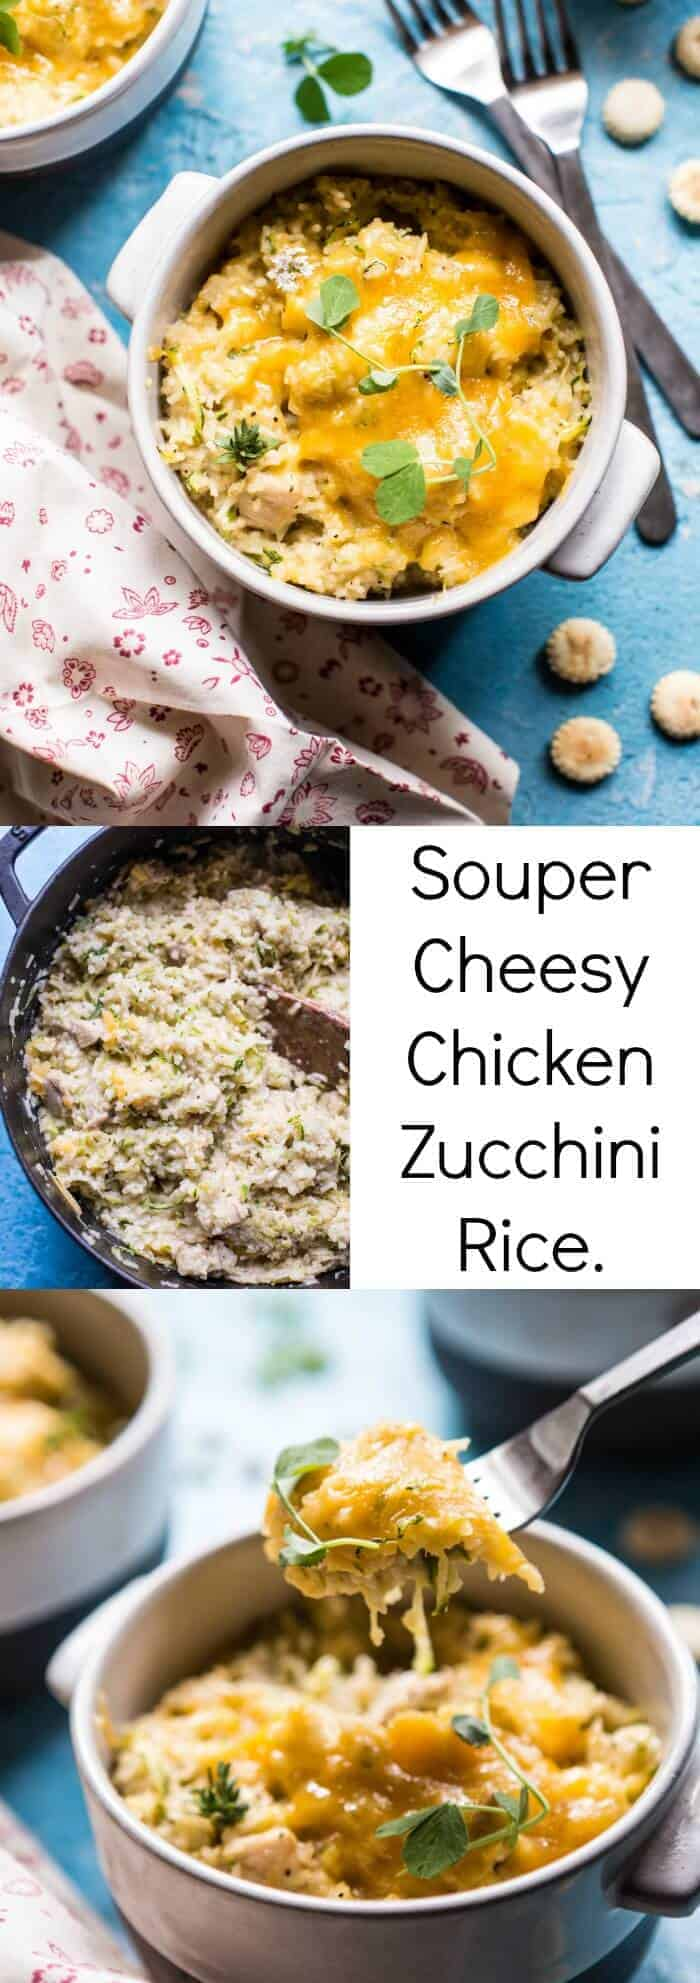 Souper Cheesy Chicken Zucchini Rice | halfbakedharvest.com @hbharvest